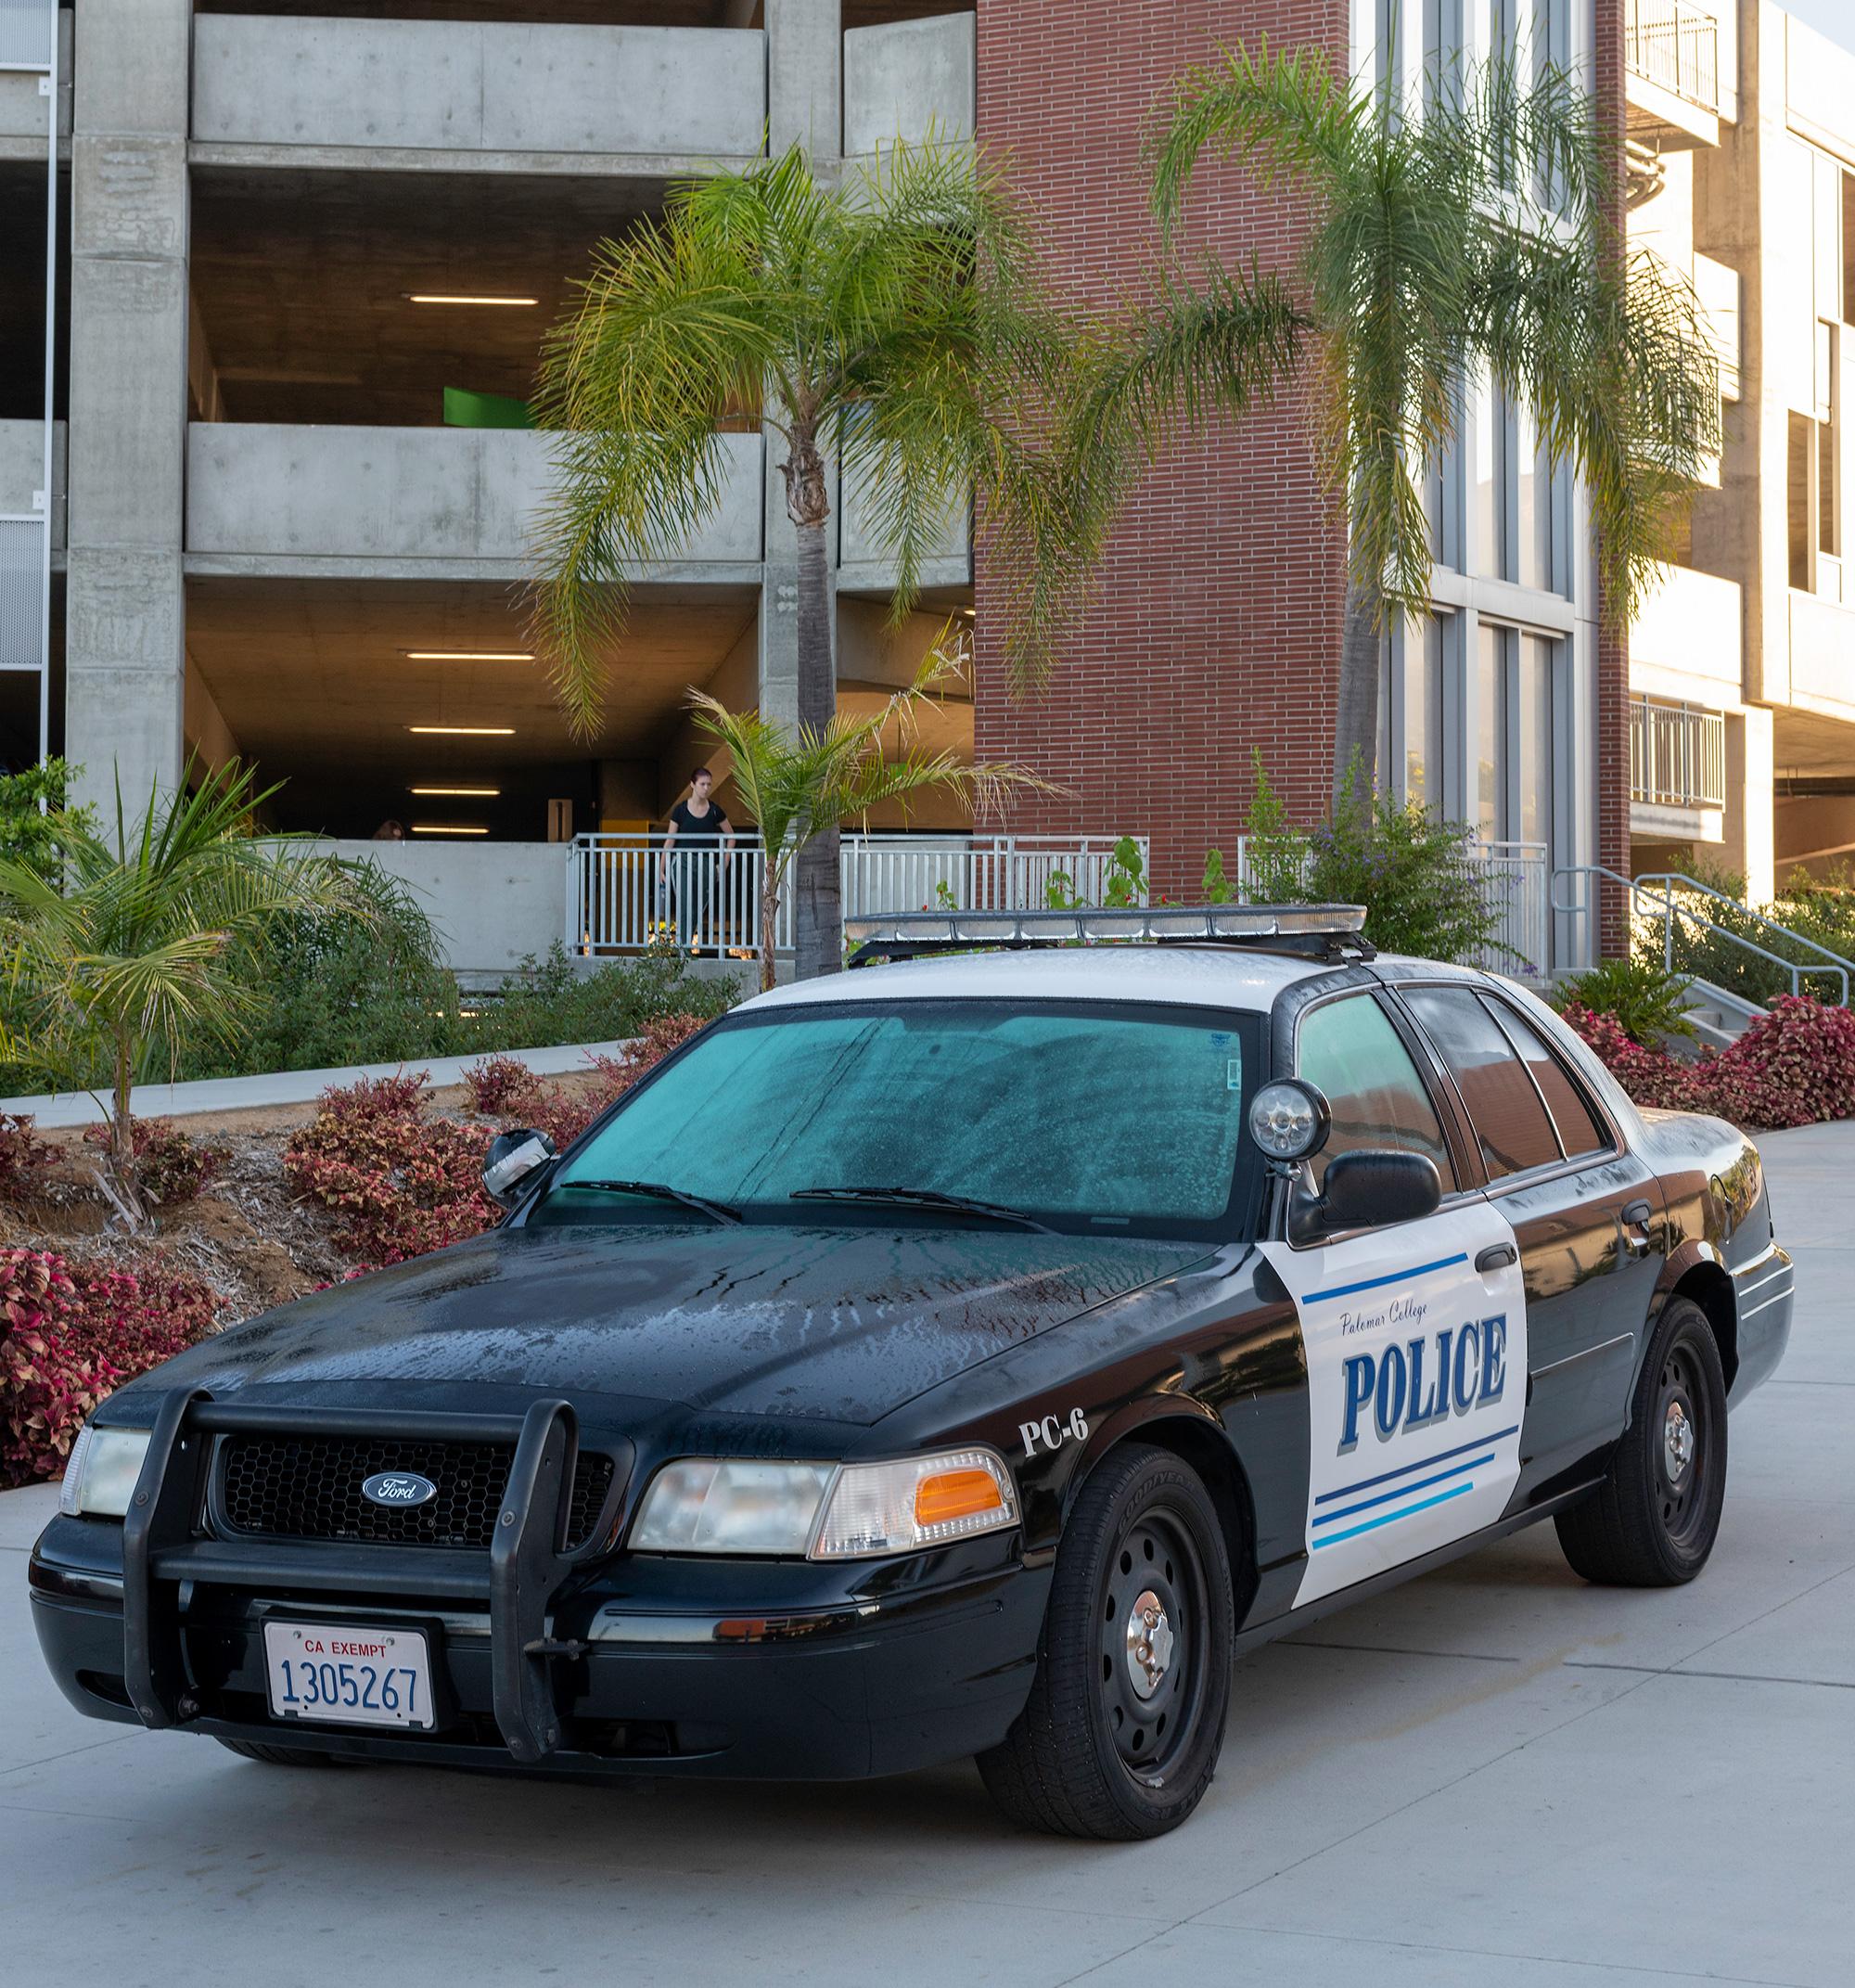 Palomar Police Car